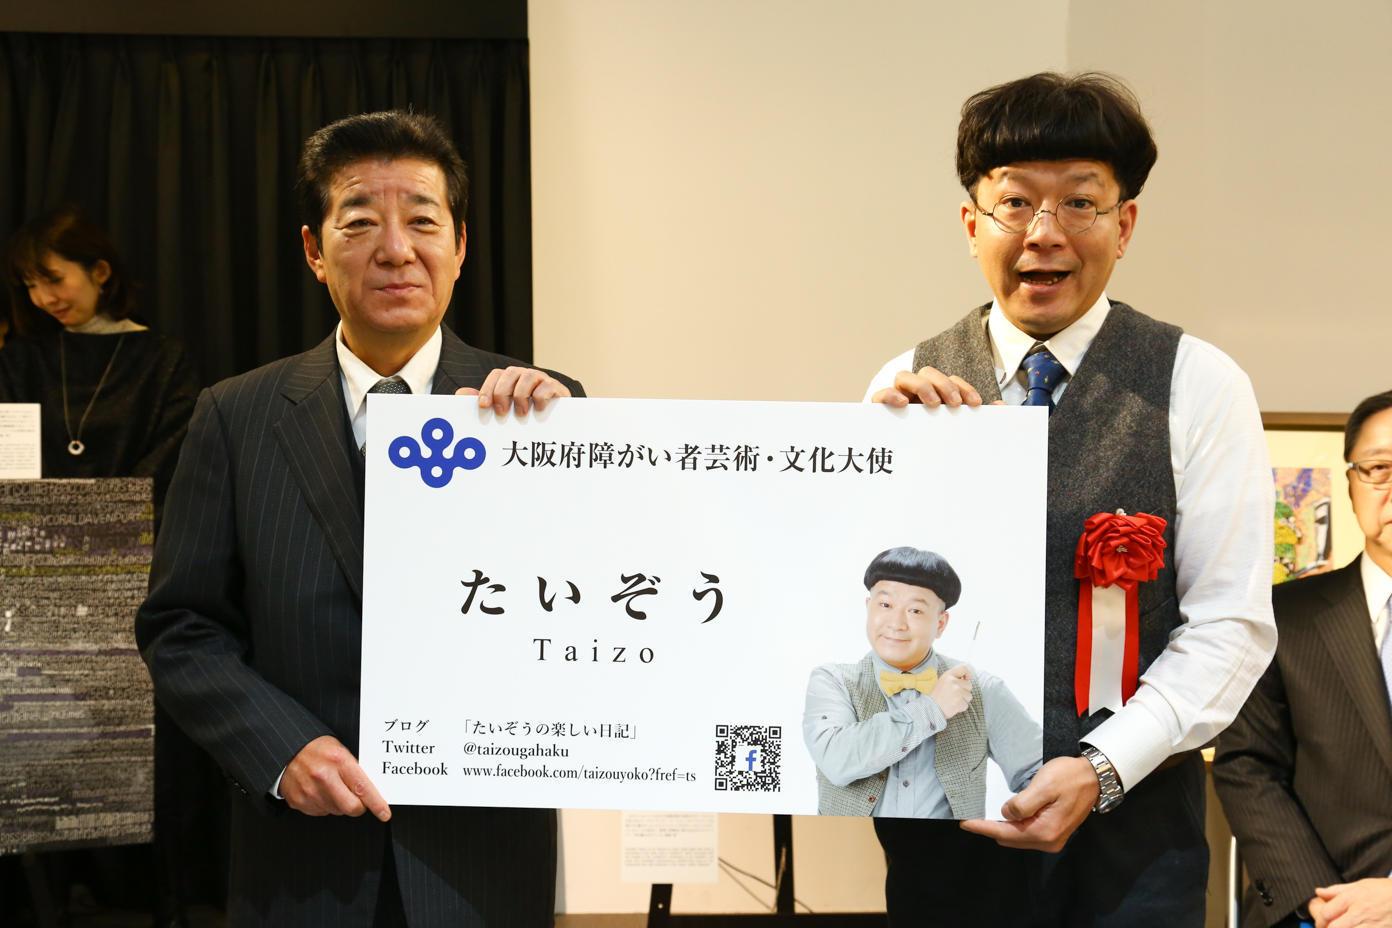 http://news.yoshimoto.co.jp/20170210155720-ae65b20fea90f4fc8b195e37913beea23ee94176.jpg